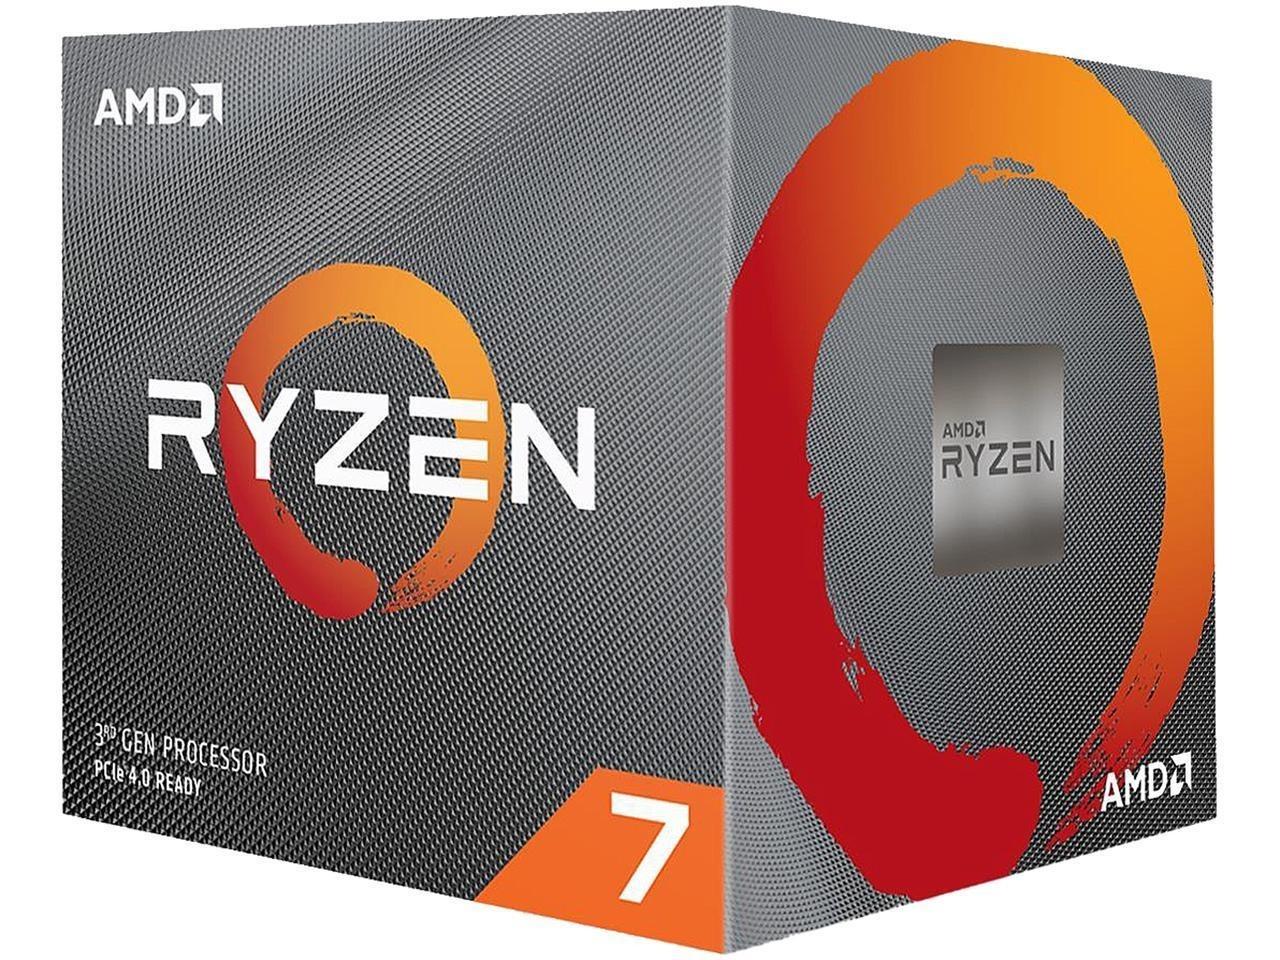 Amd Ryzen 7 3rd Gen 3800x 3 9 Ghz 8 Core Am4 Socket Am4